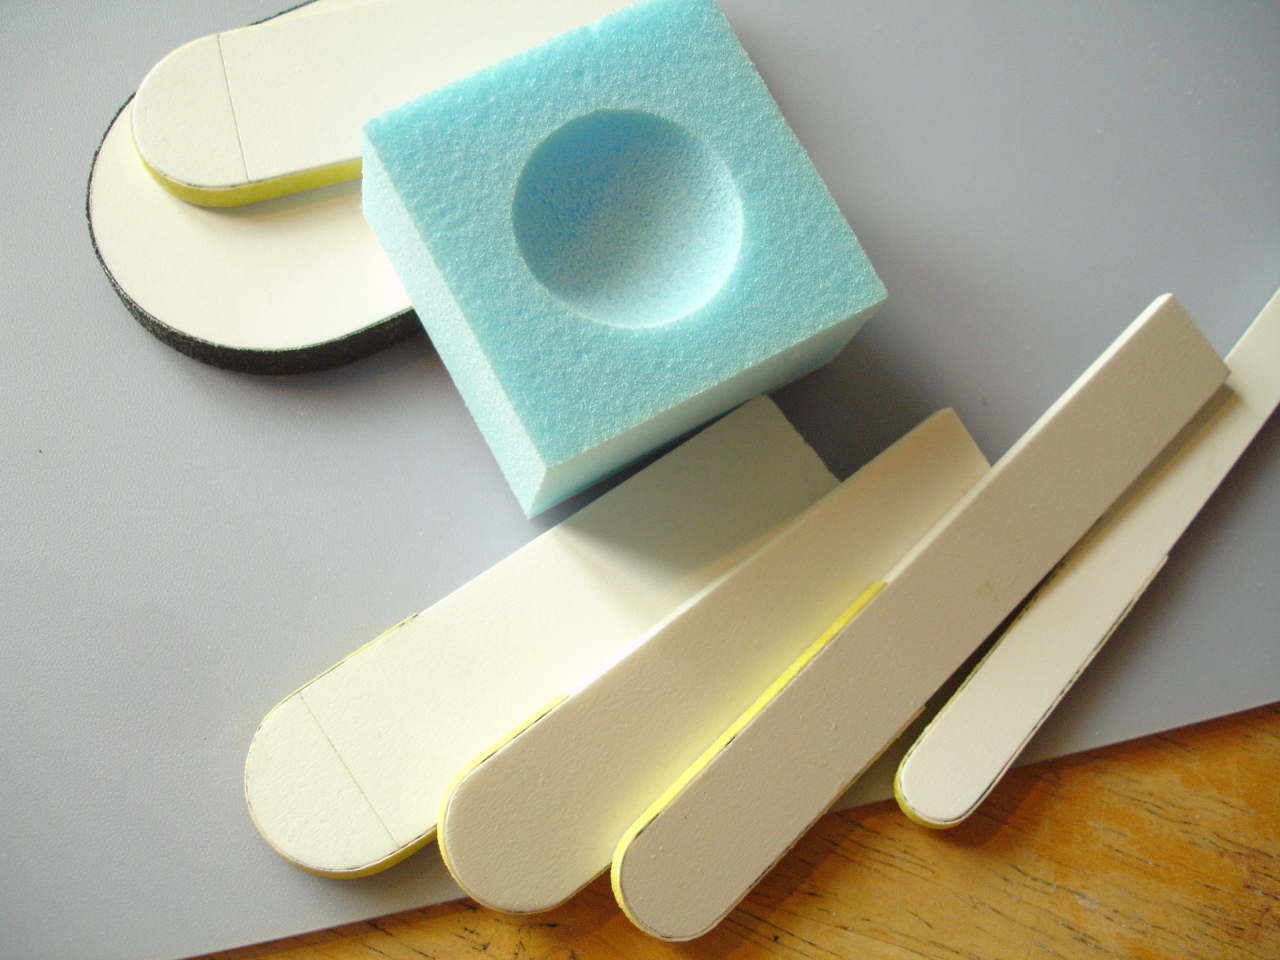 Shaping Styrofoam Davidneat